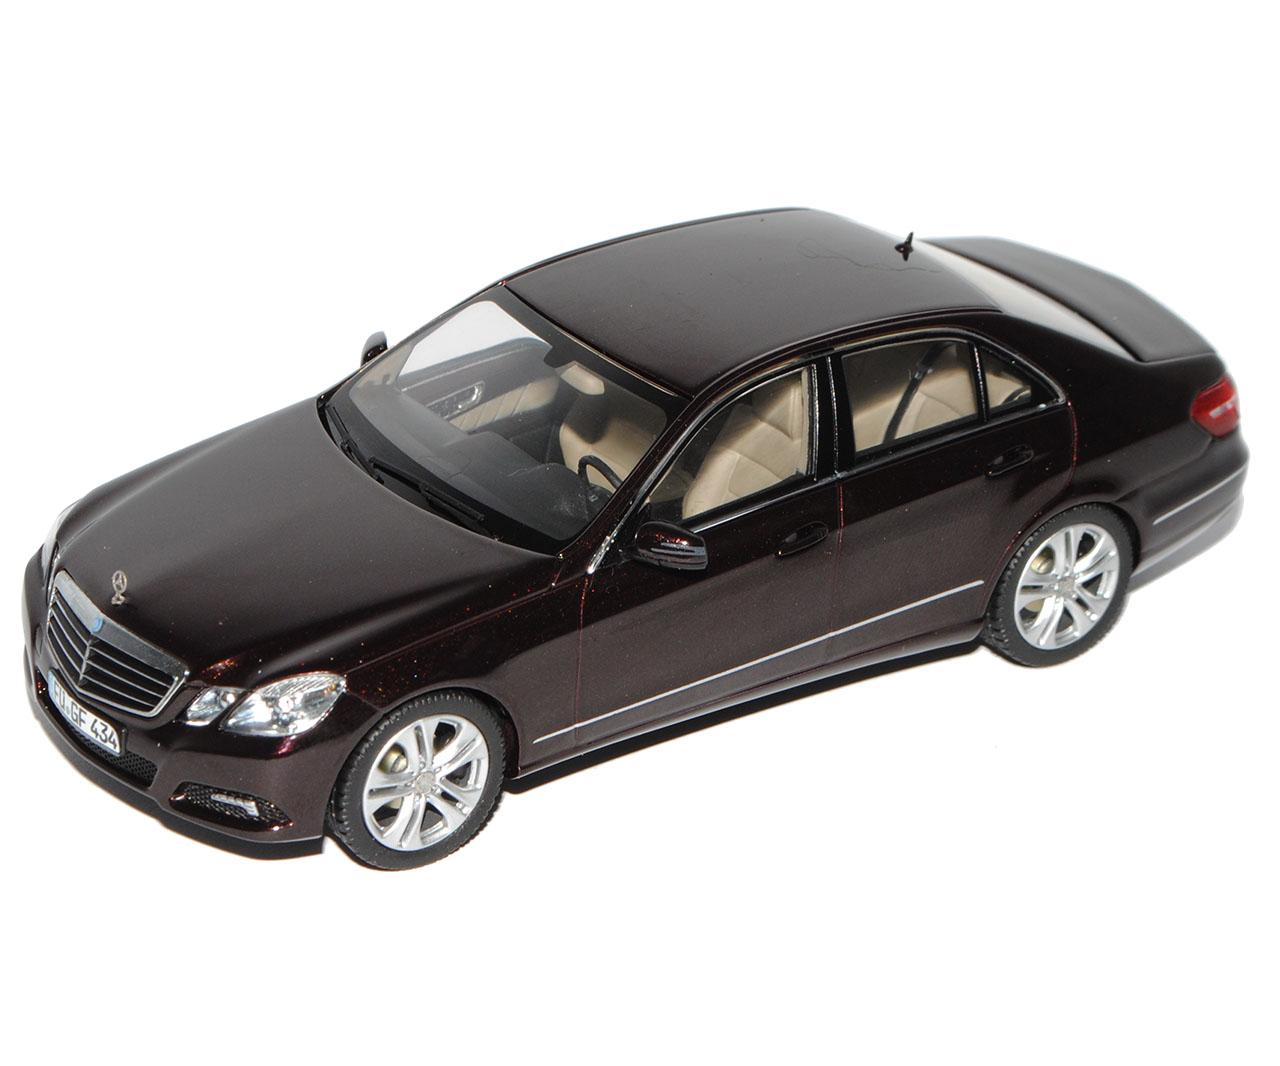 MERCEDES-BENZ E CLASSE E MERCEDES-BENZ w212 berlina Avantgarde Marronee Nero prima Facelift mo... 6742b0